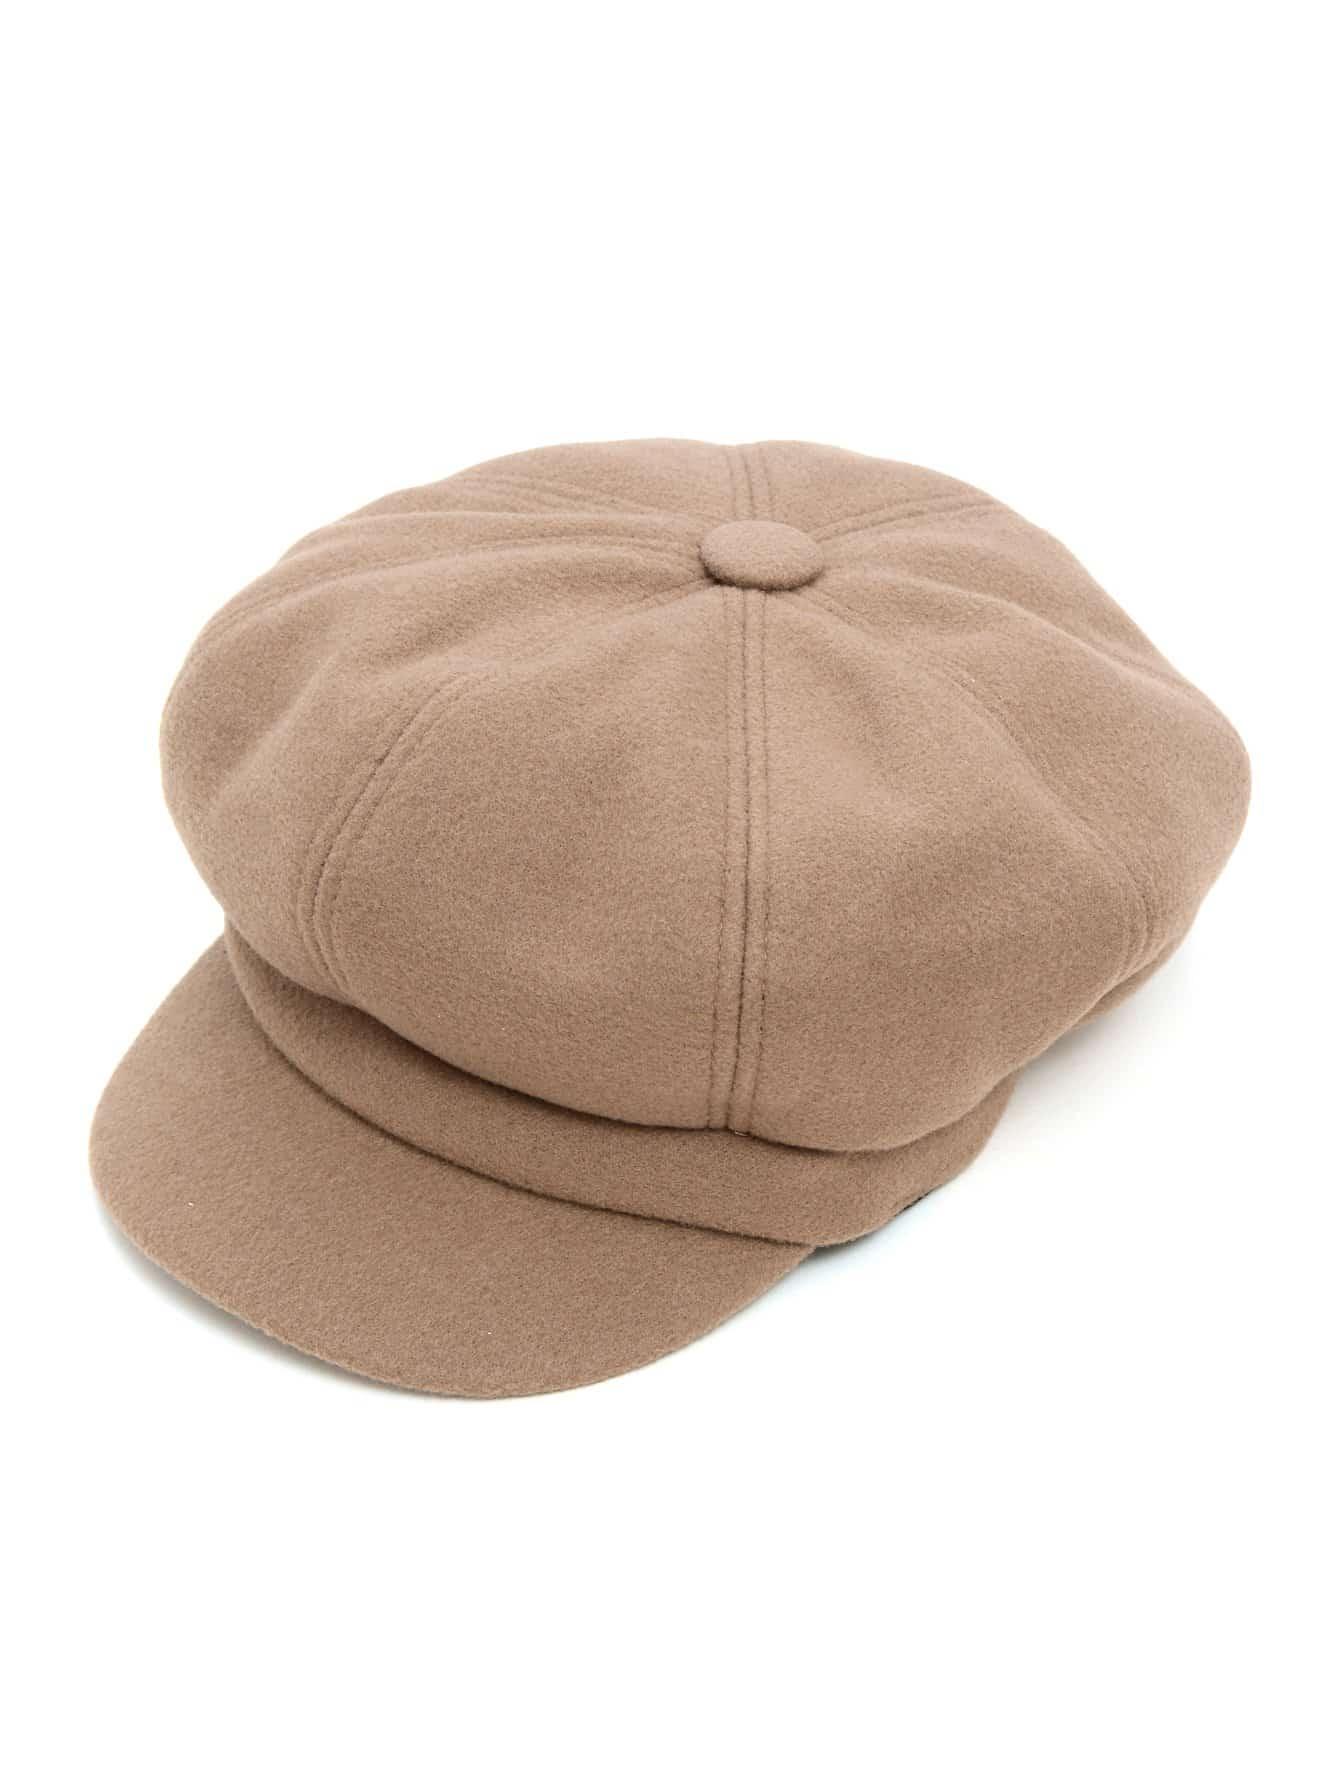 Обычный Эластичный Шлемом Мальчика Хлебопека